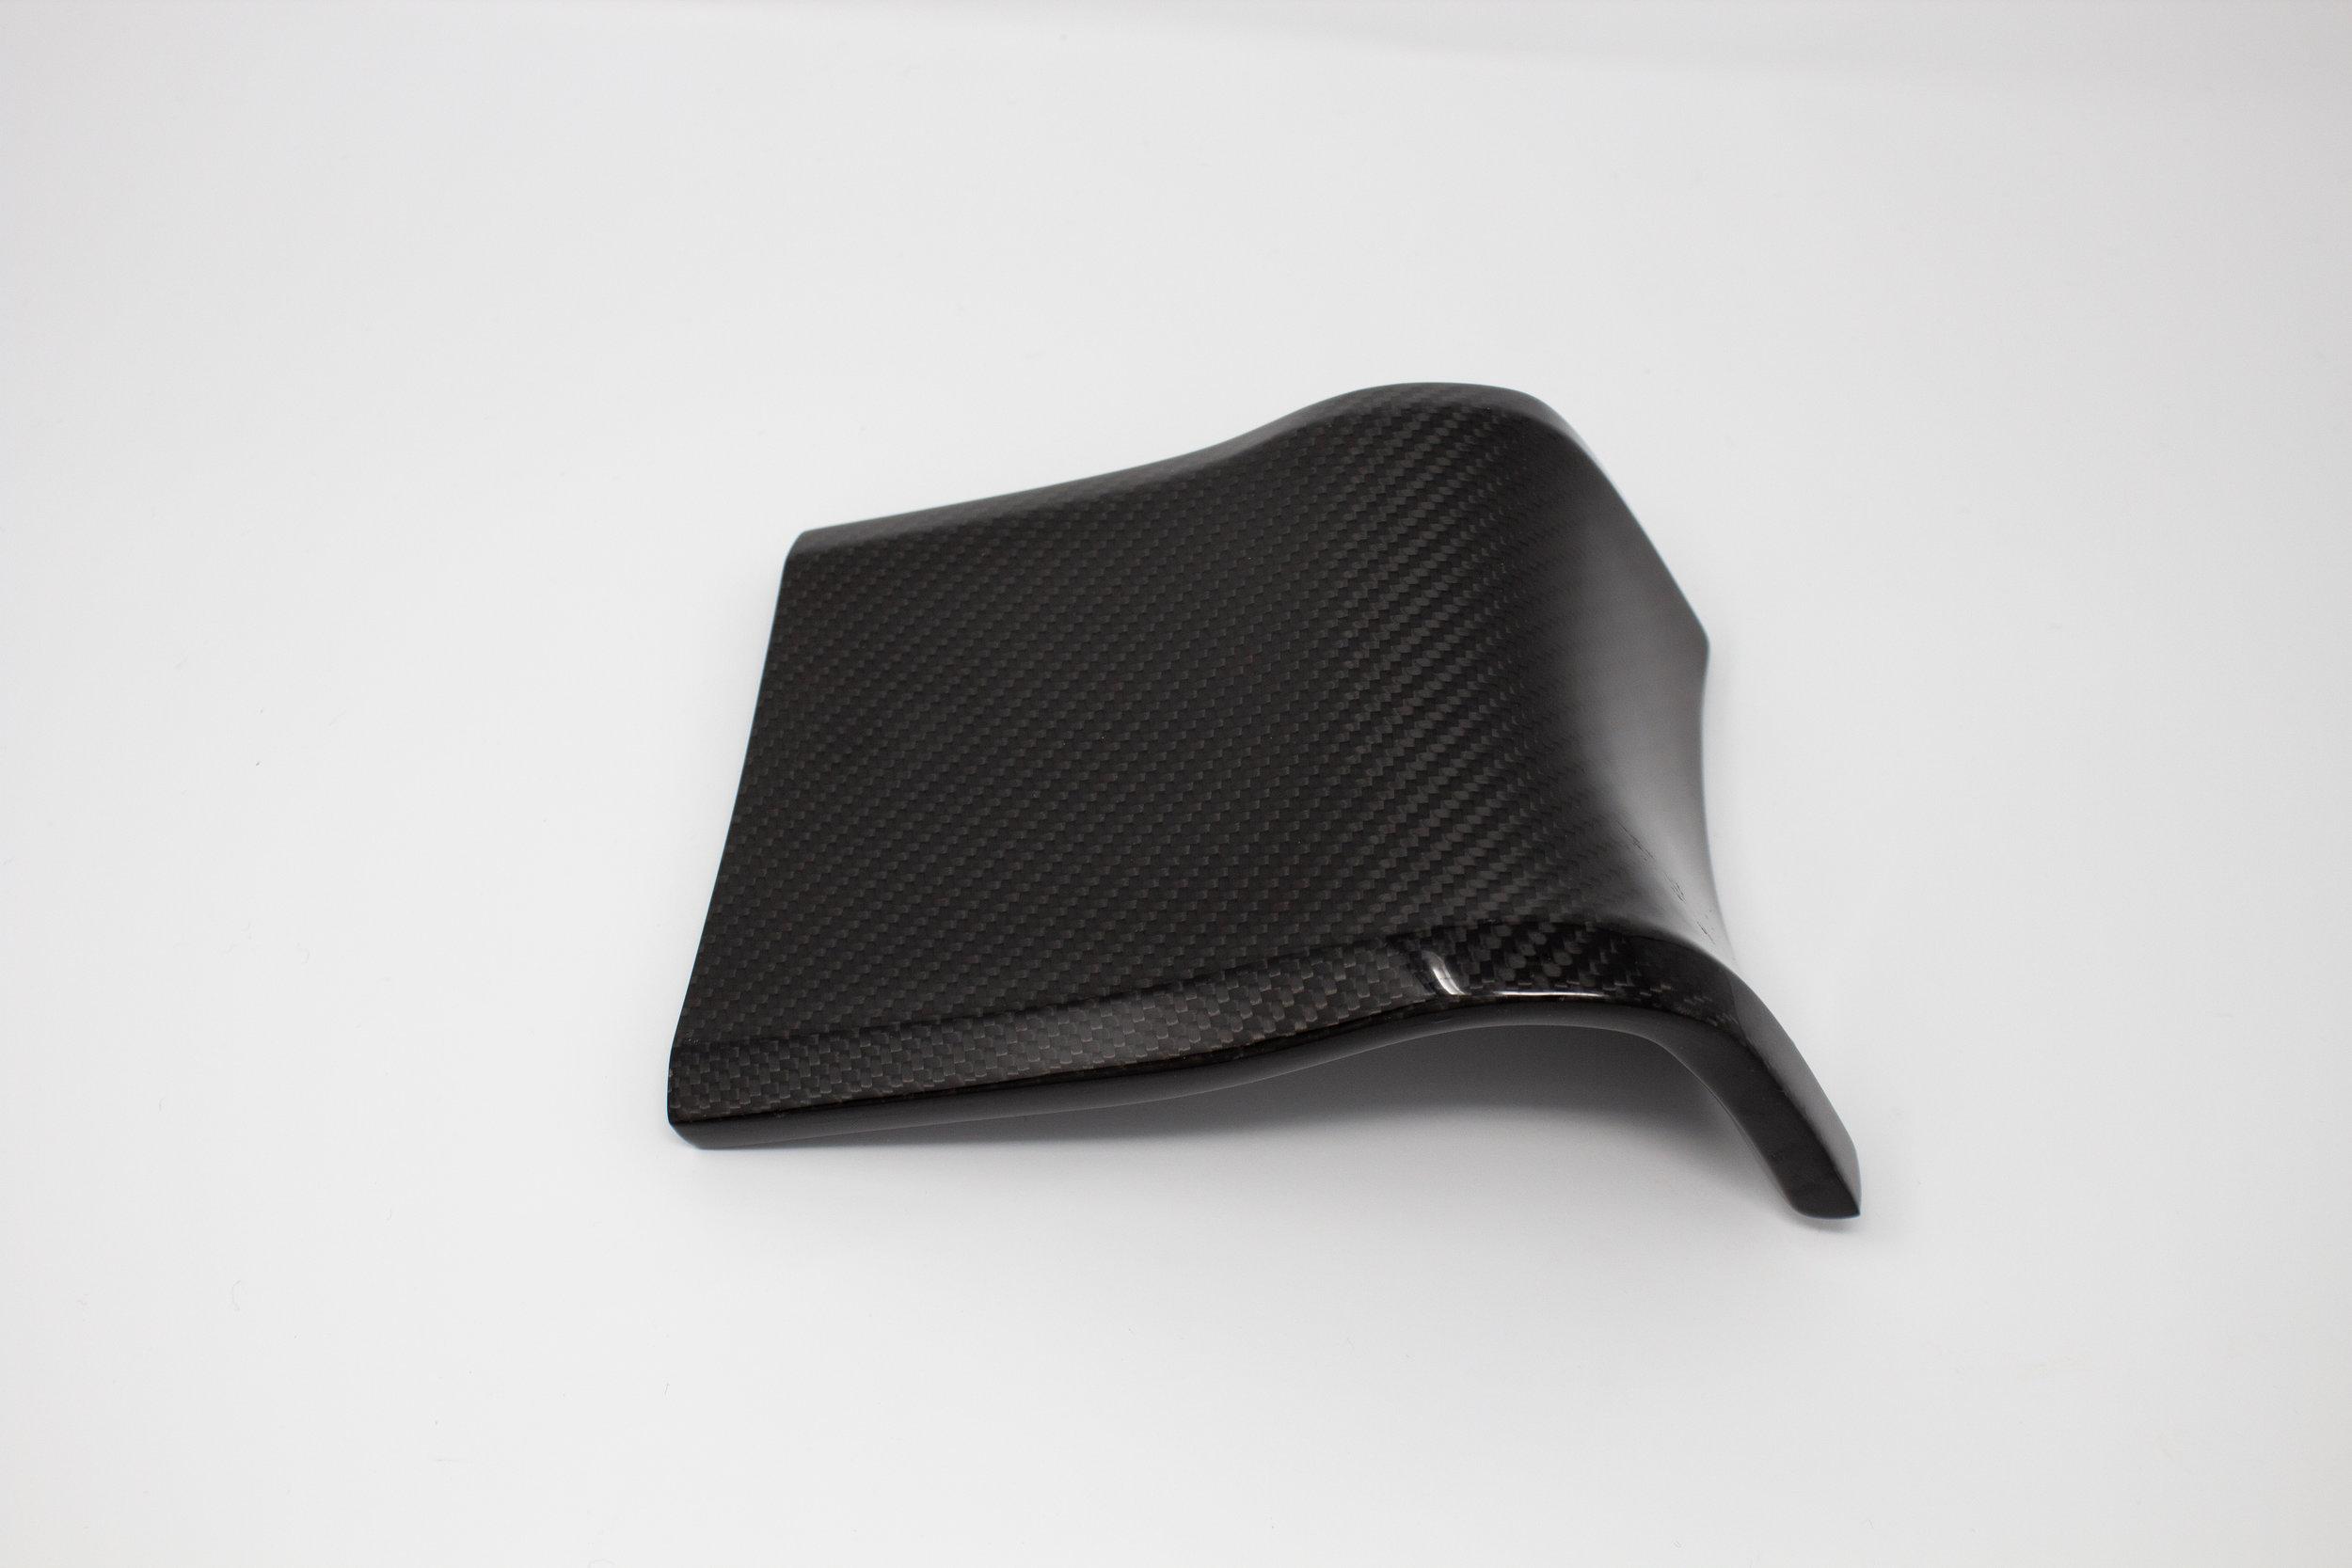 ford-carbon-fiber-door-trim-2.jpg